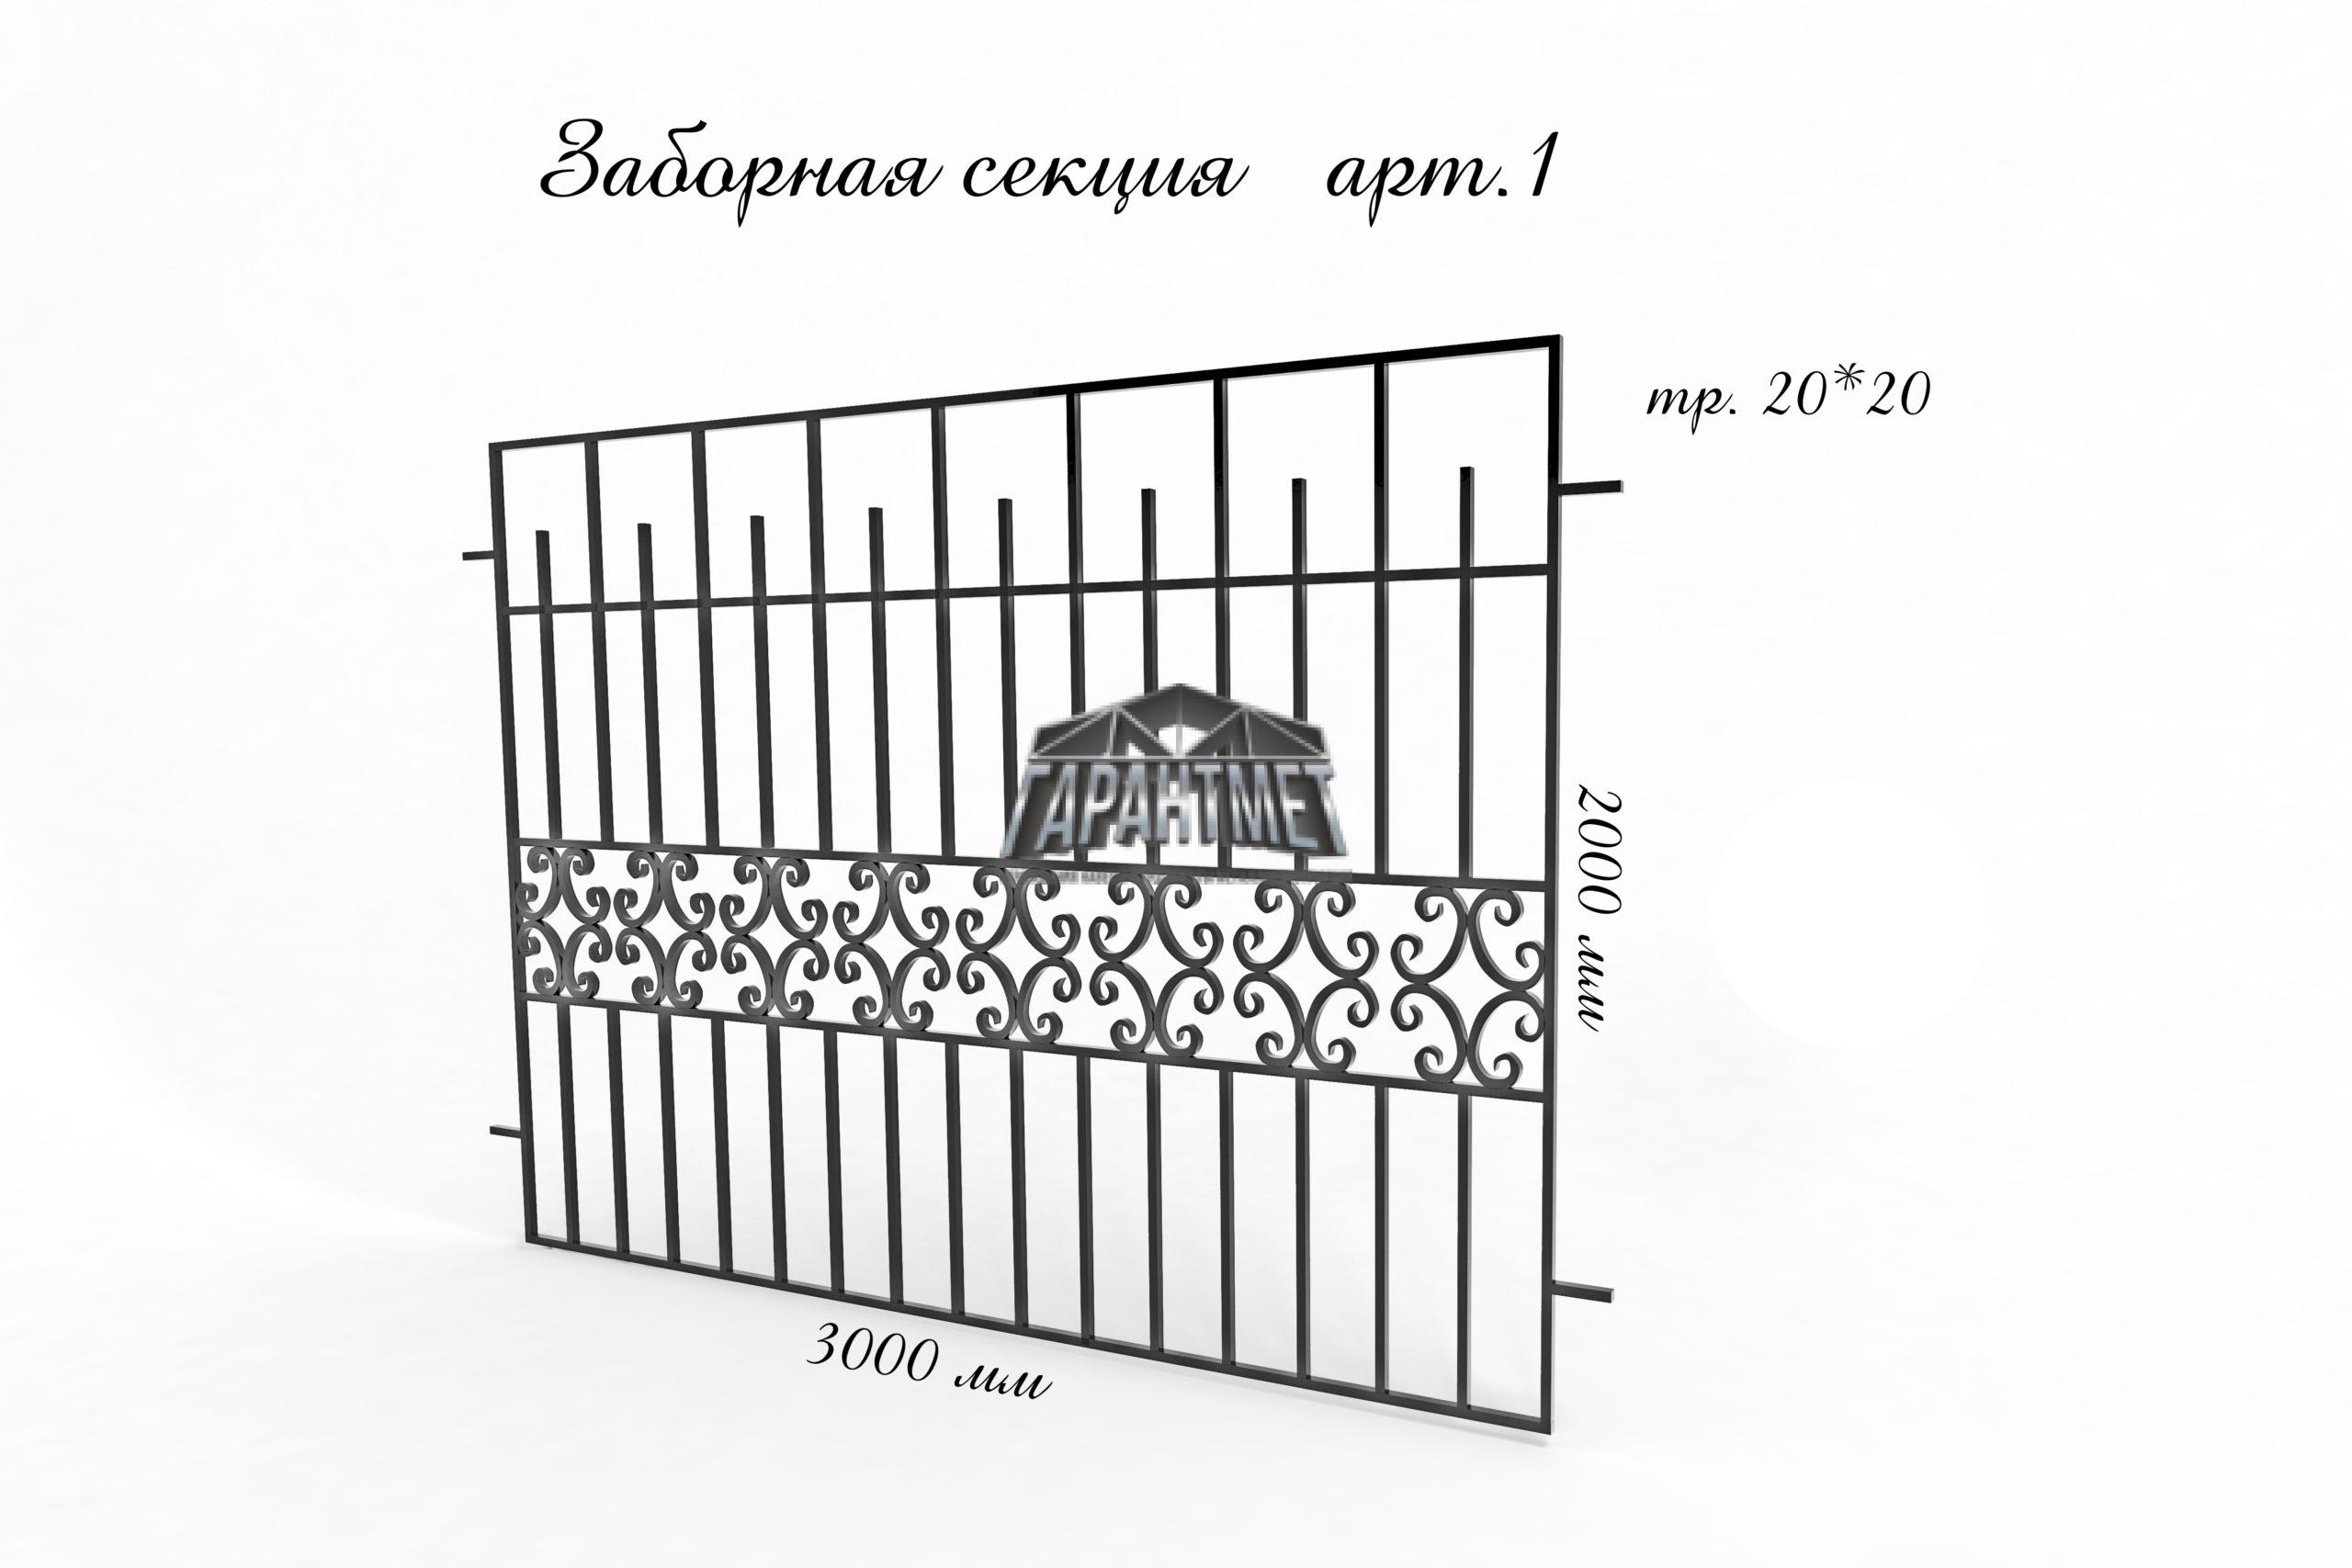 Заборная секция 1-1